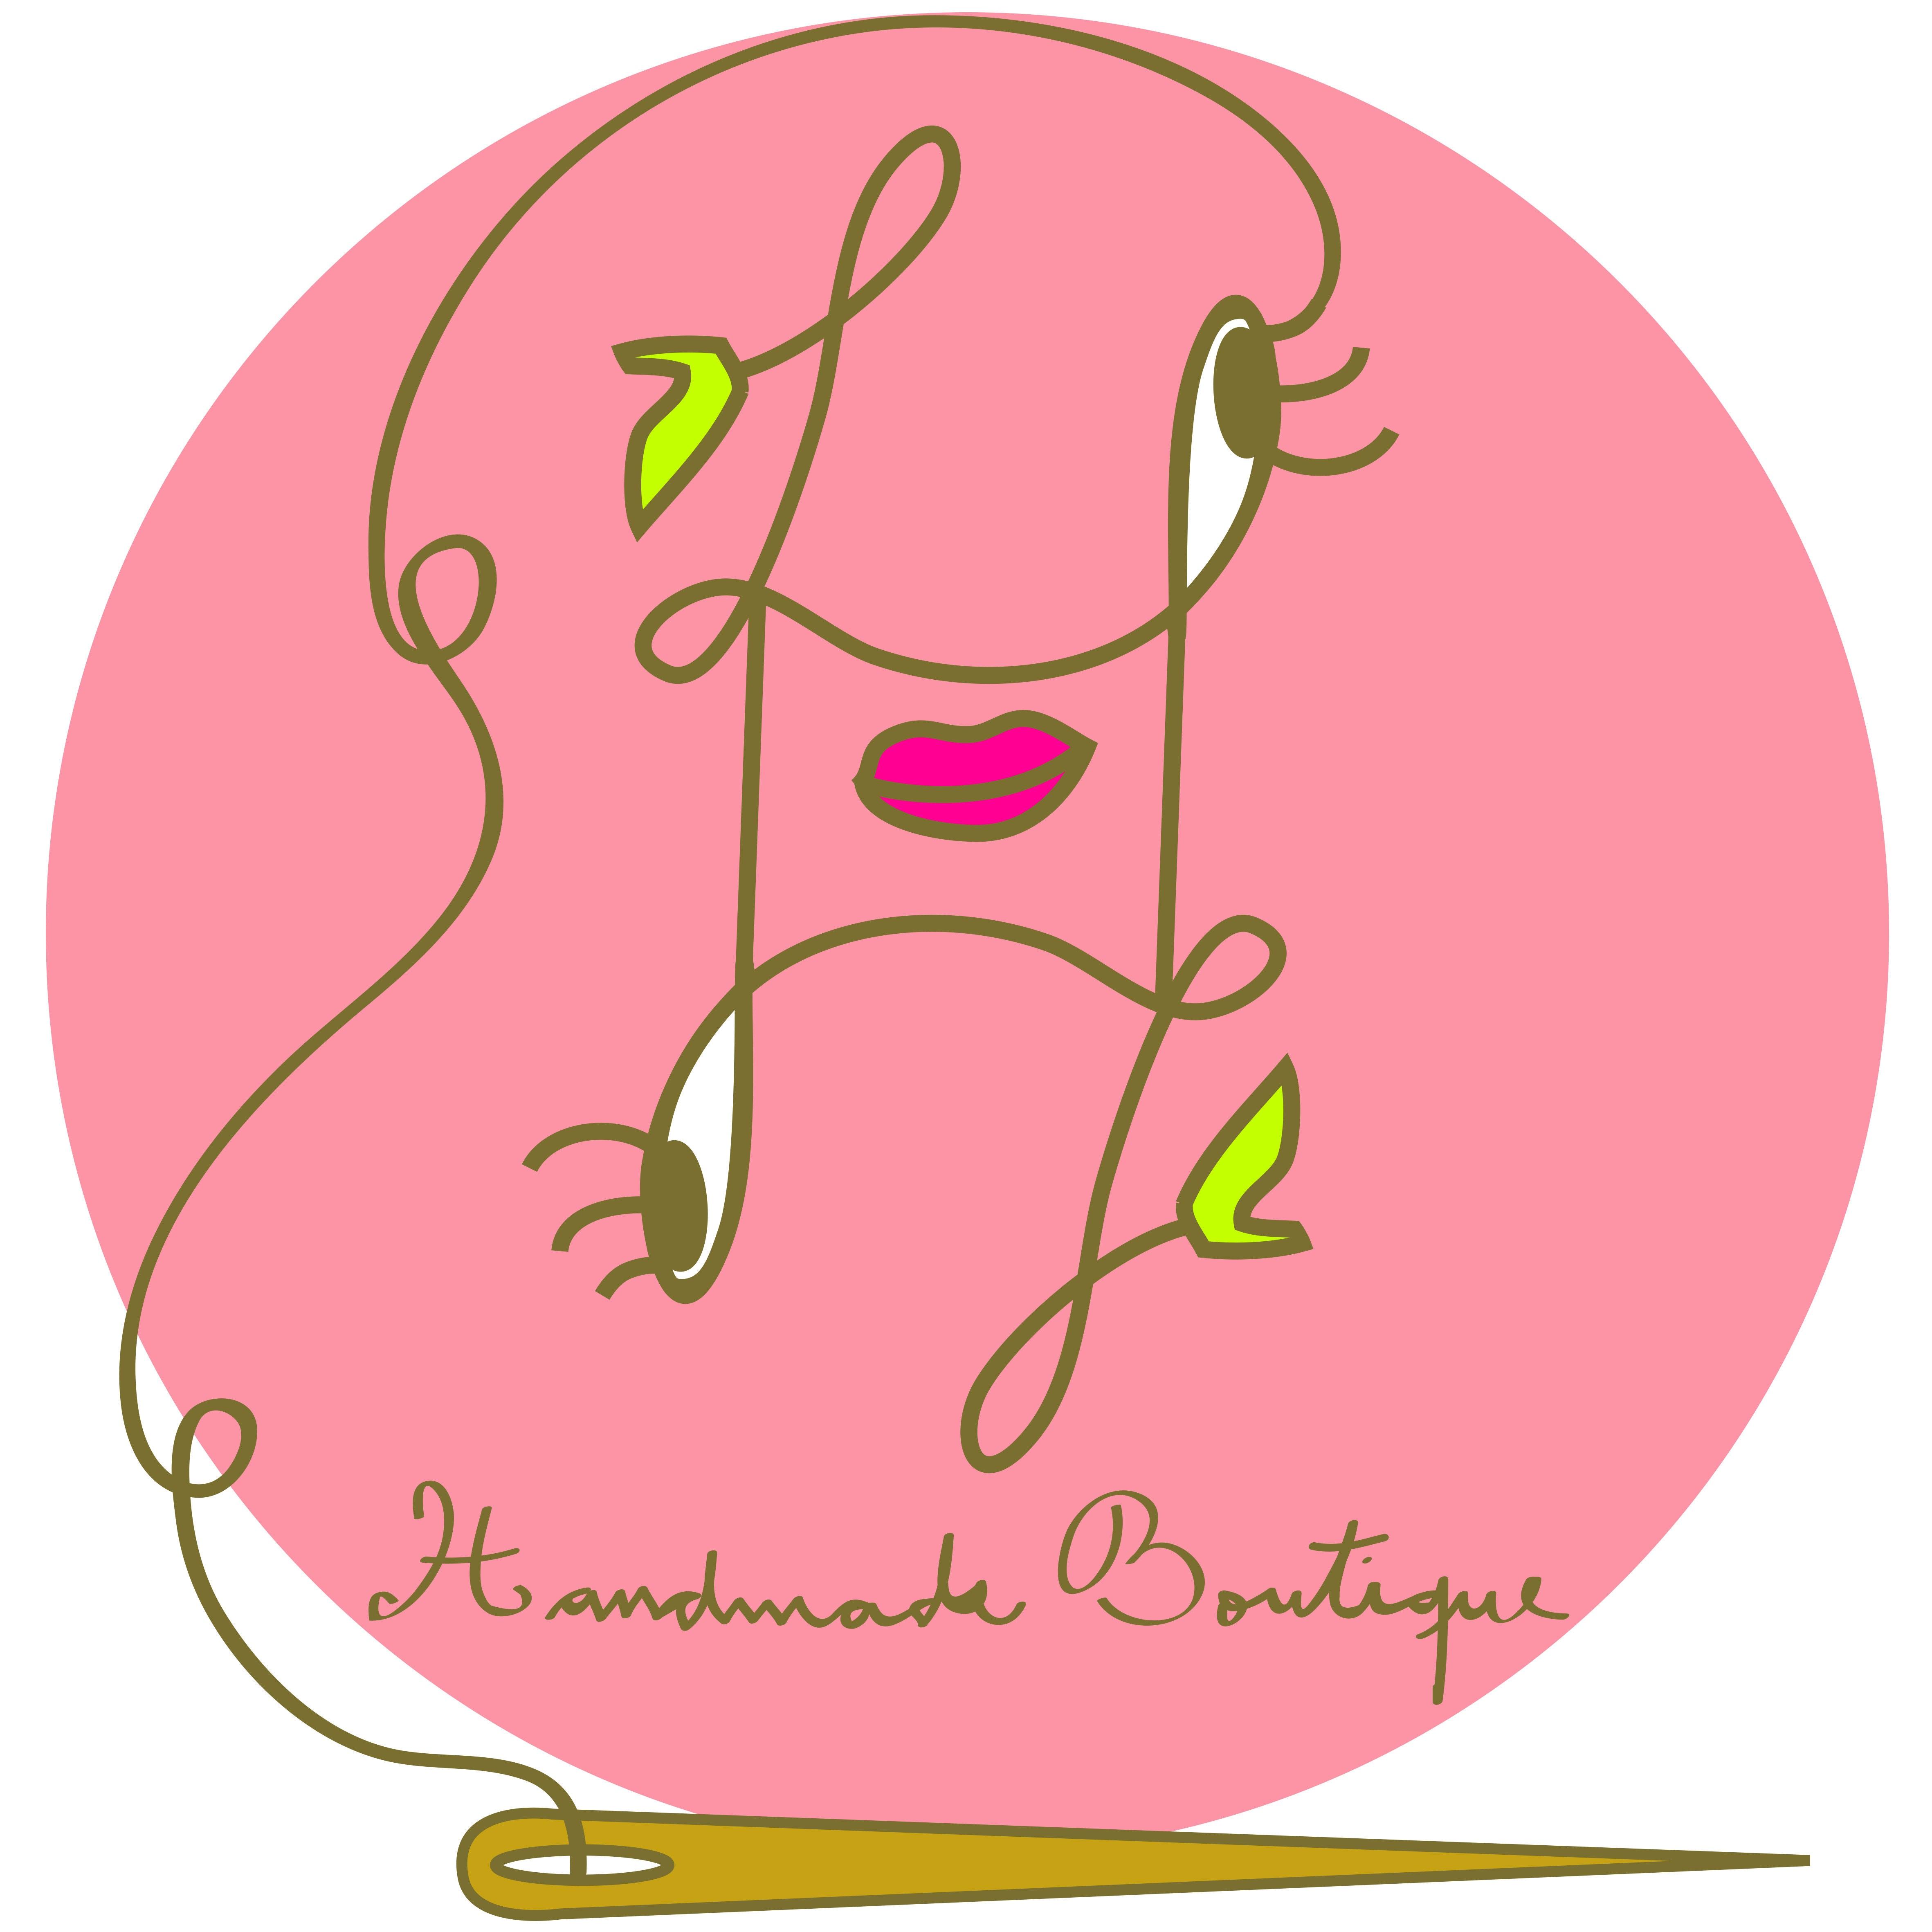 HandmadeBoutiqueByLF